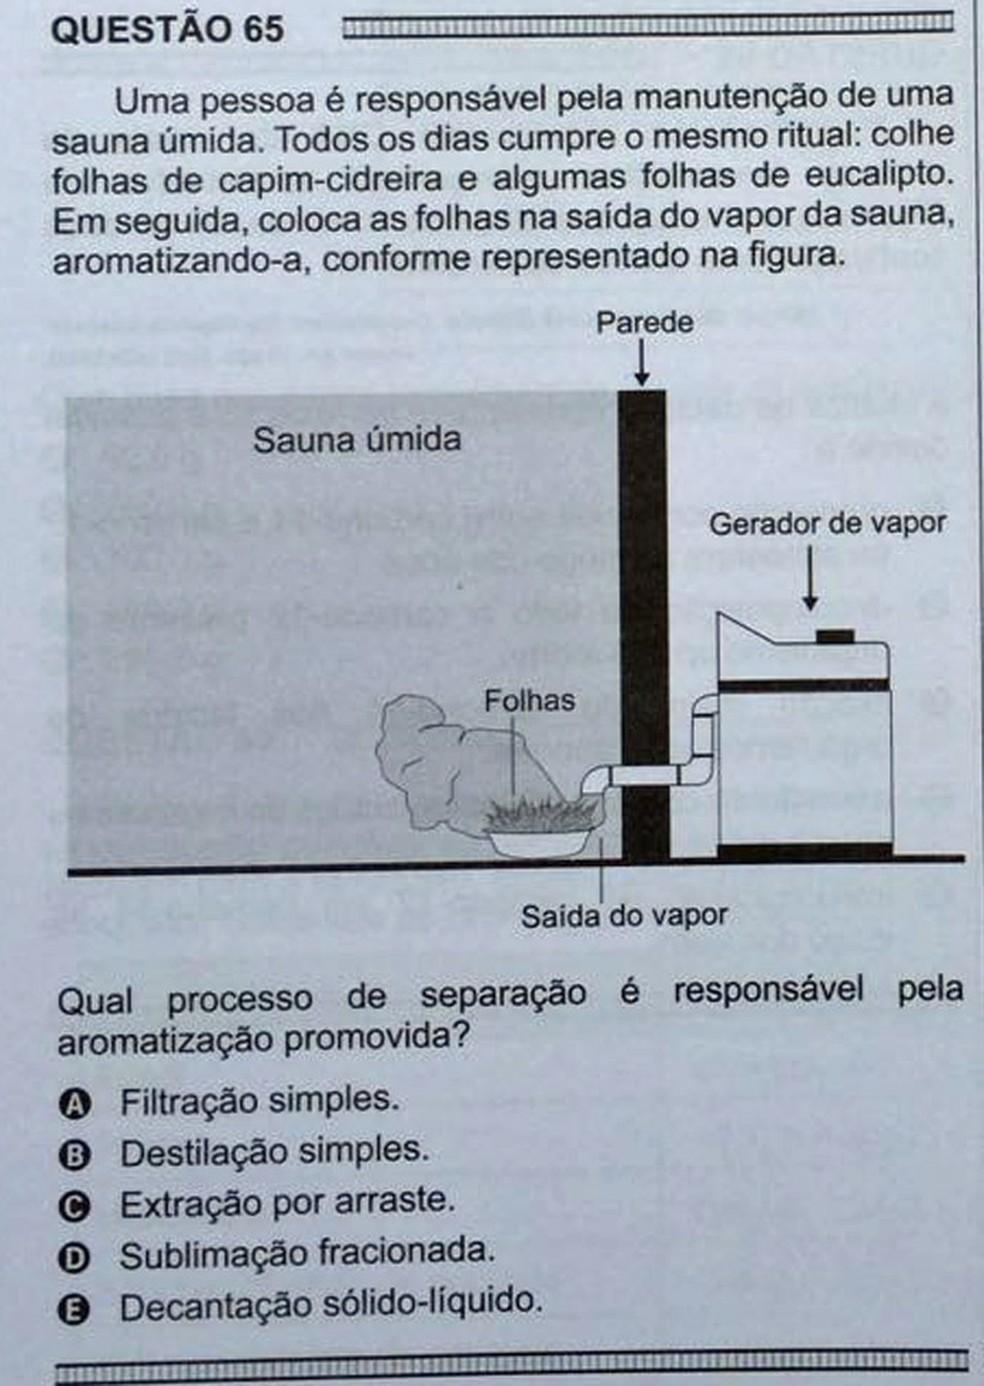 ENEM 2016 - 1º DIA - PROVA BRANCA - QUESTÃO 65 (Foto: G1 )